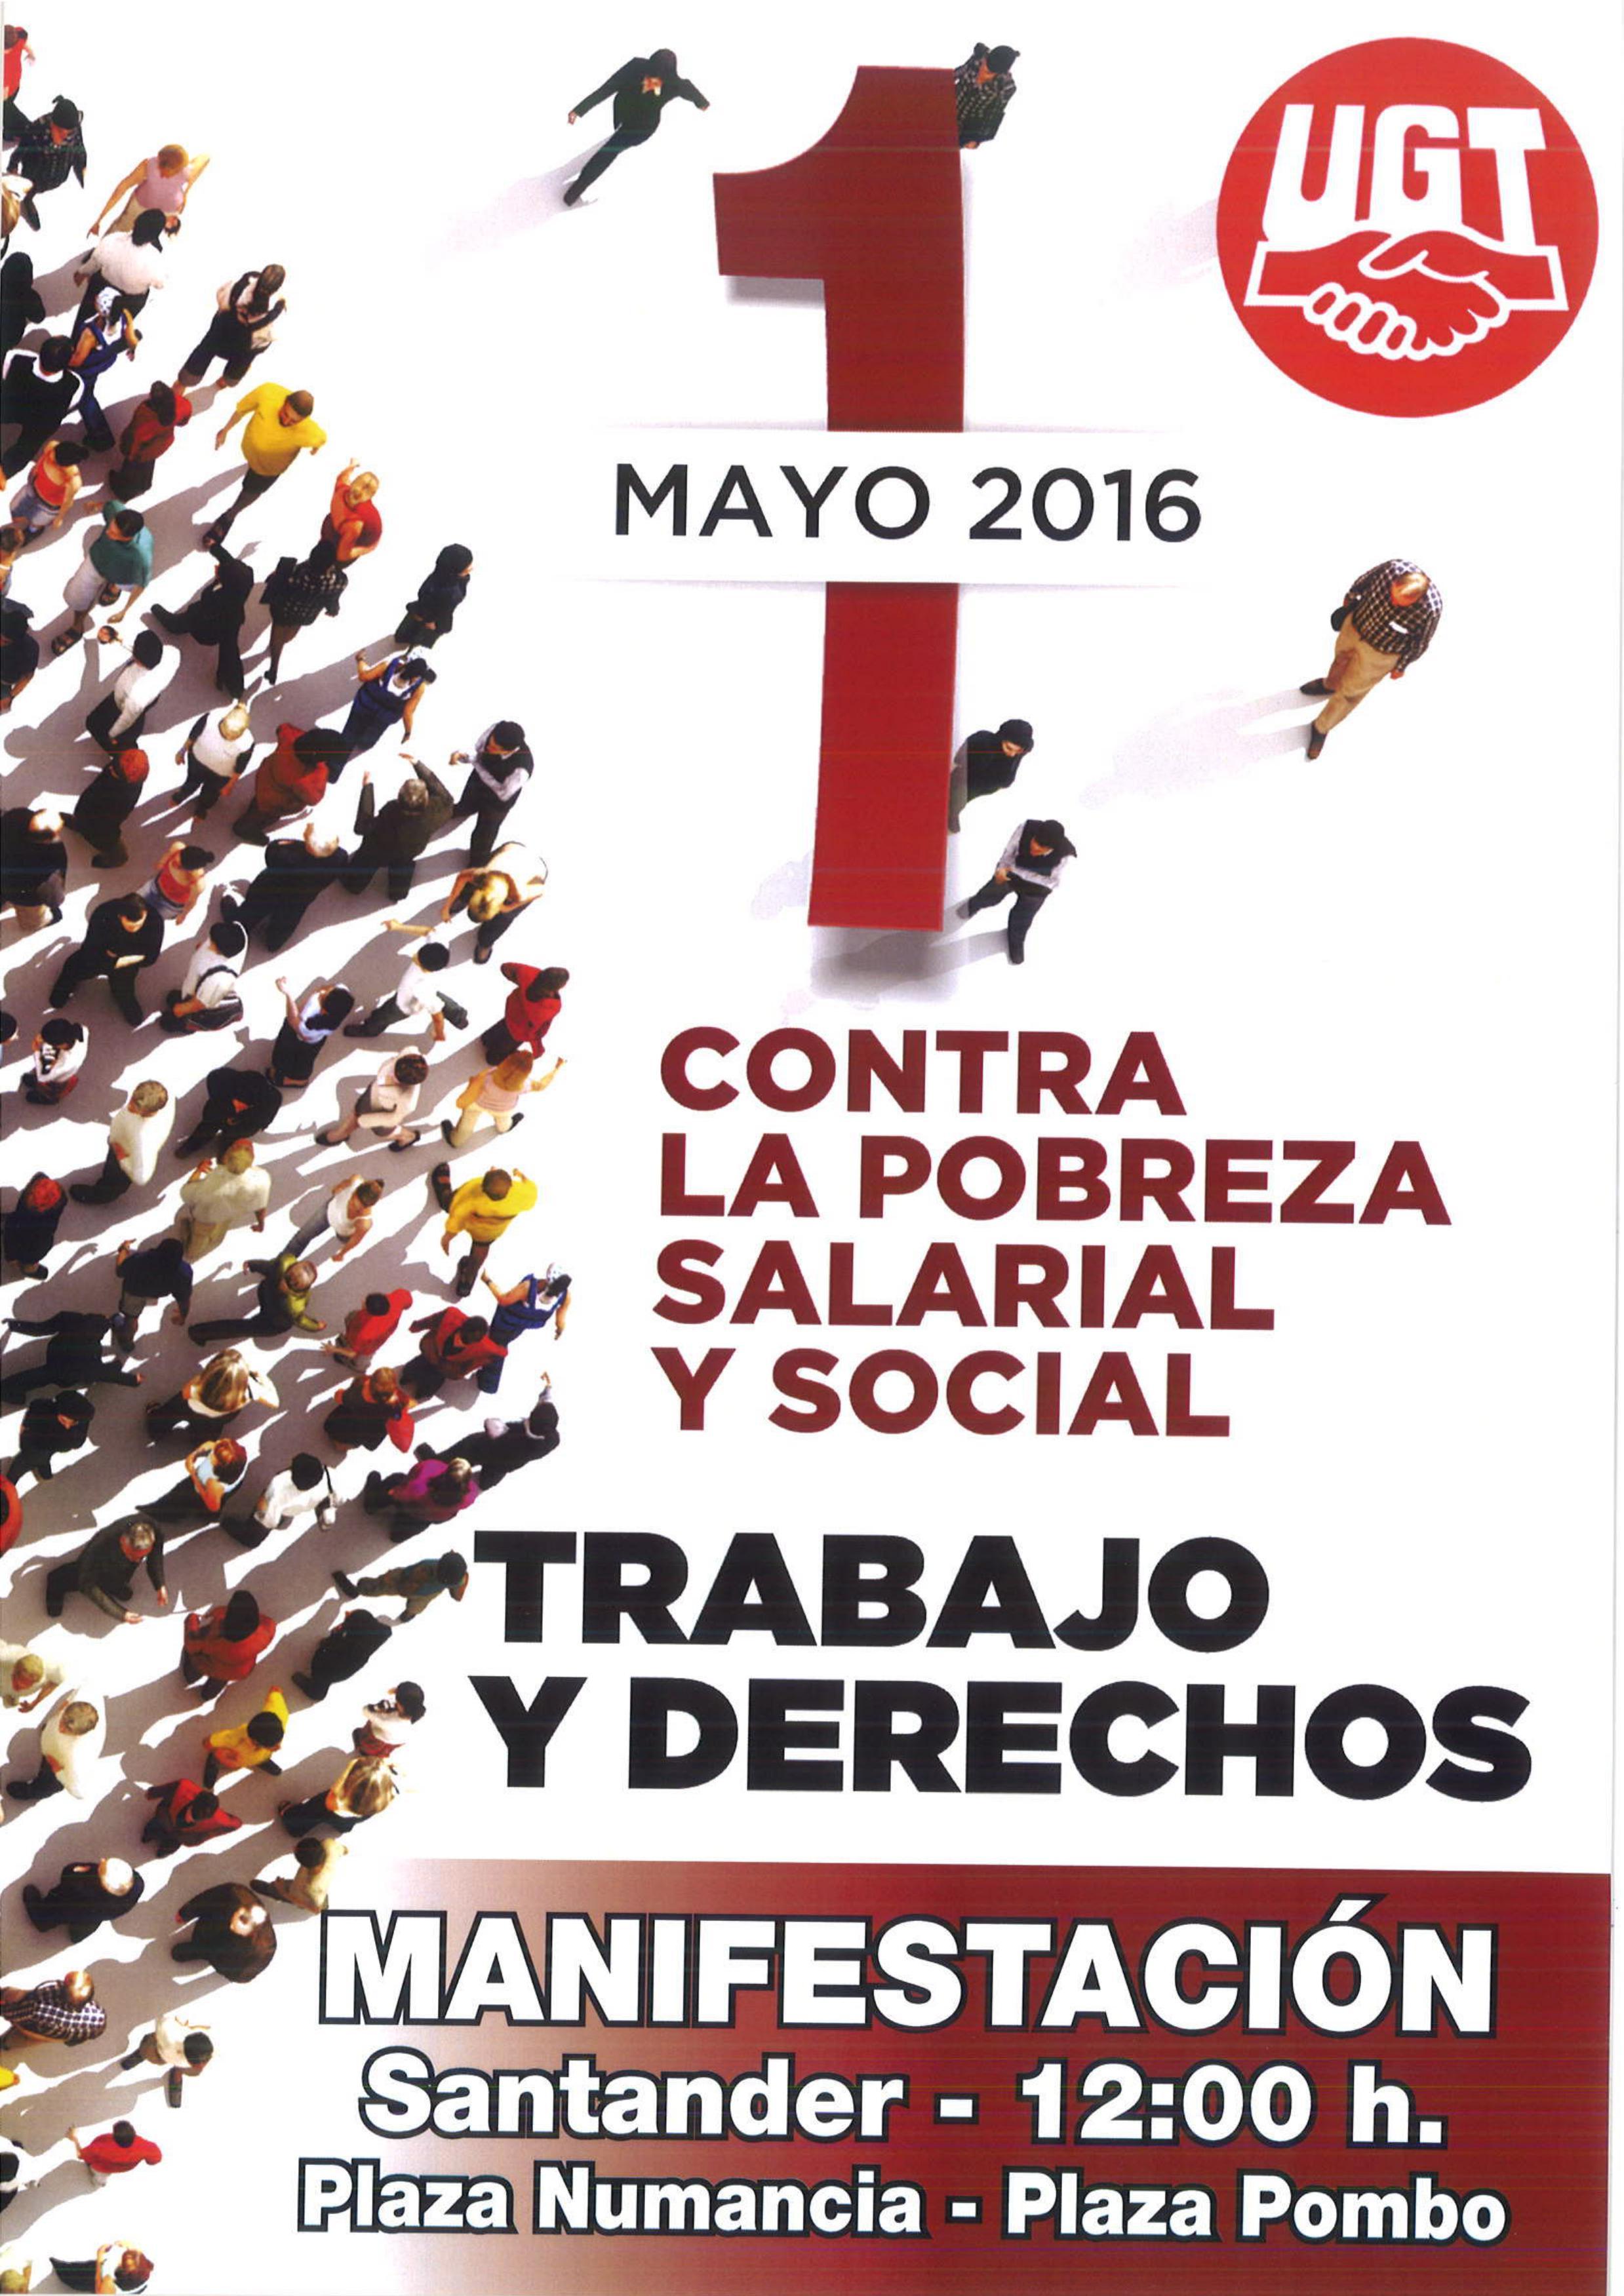 MANIFESTACION 1 DE MAYO 2016